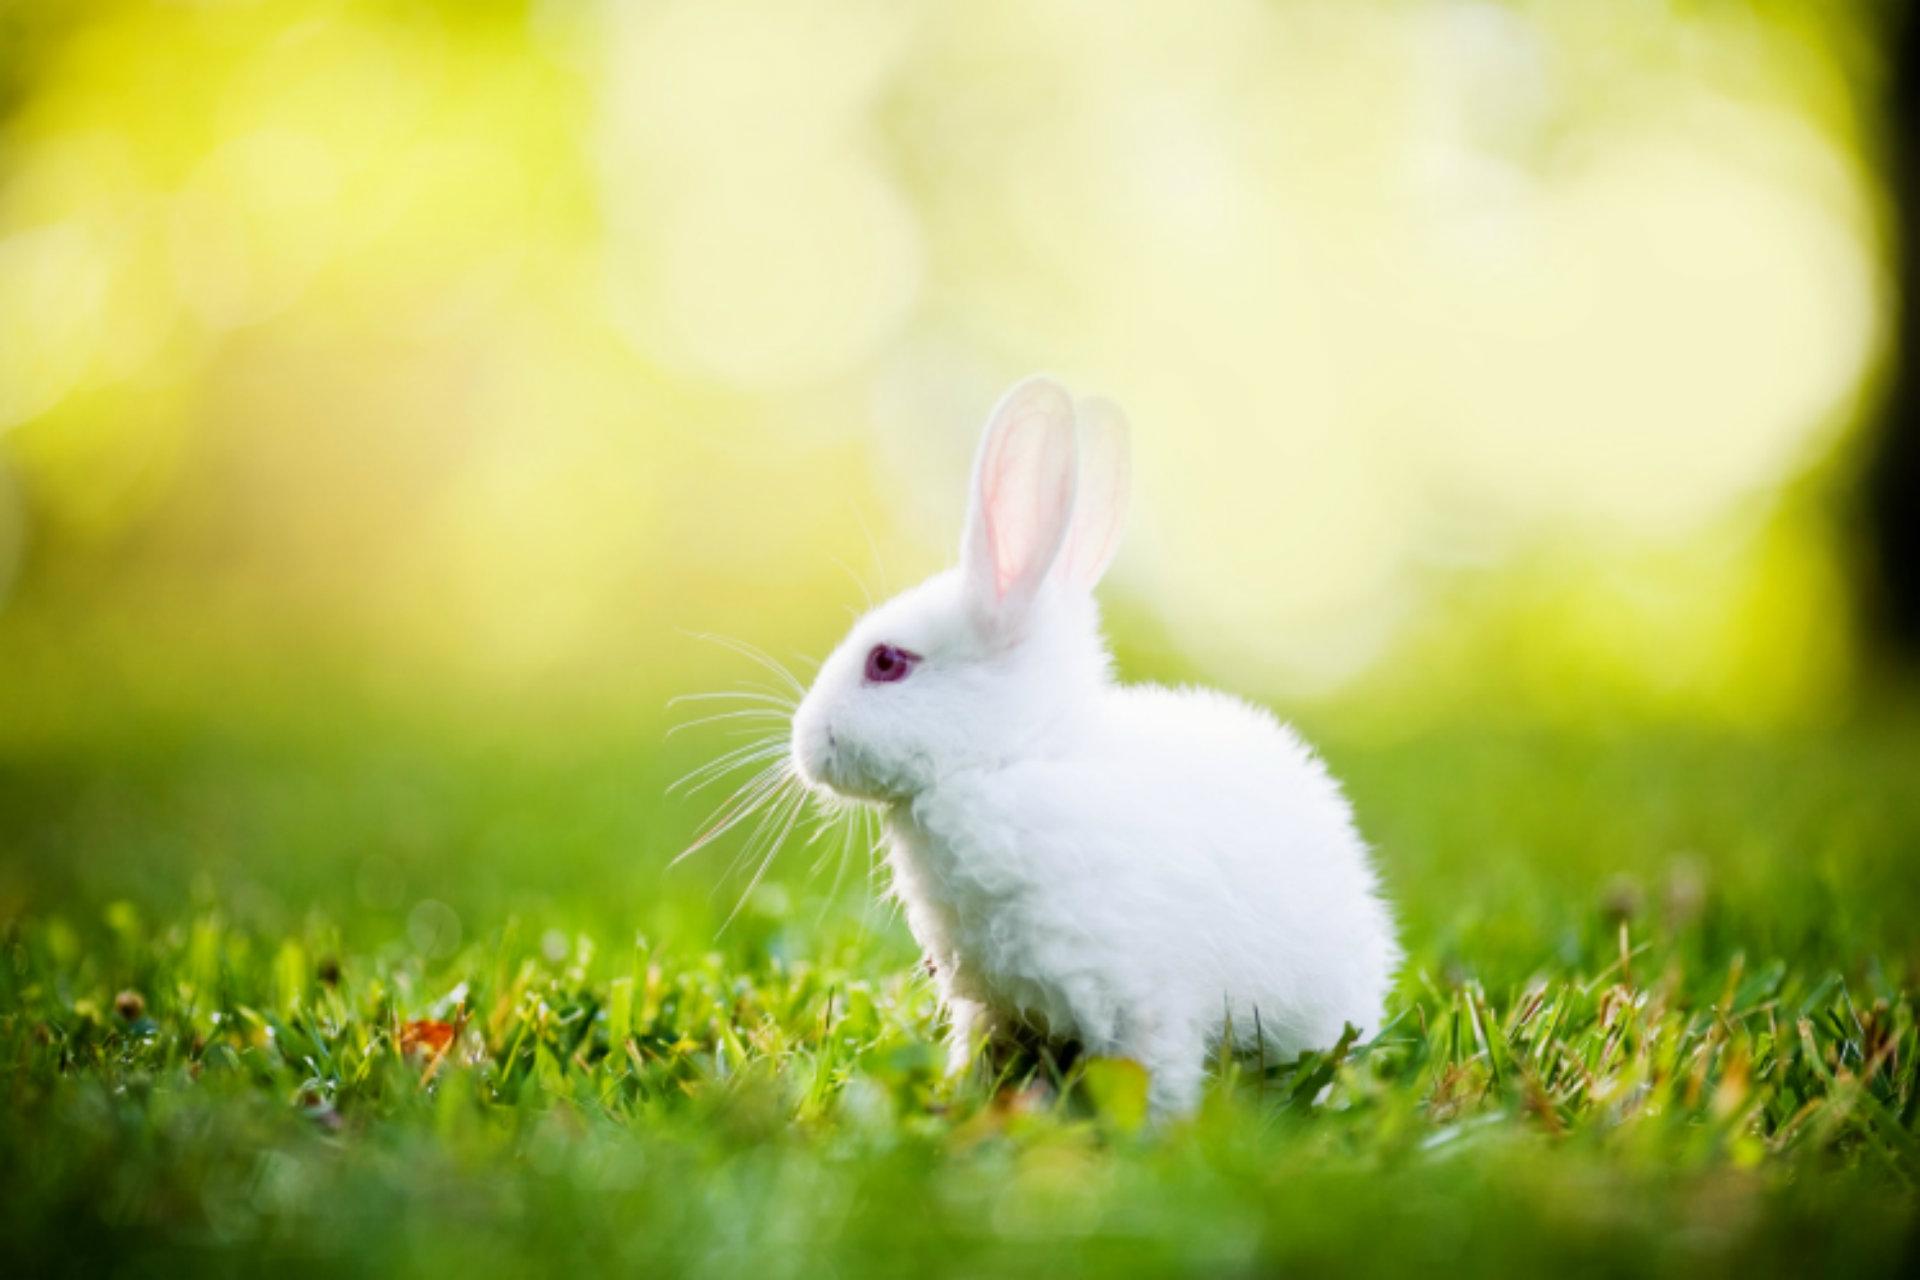 photos of bunny